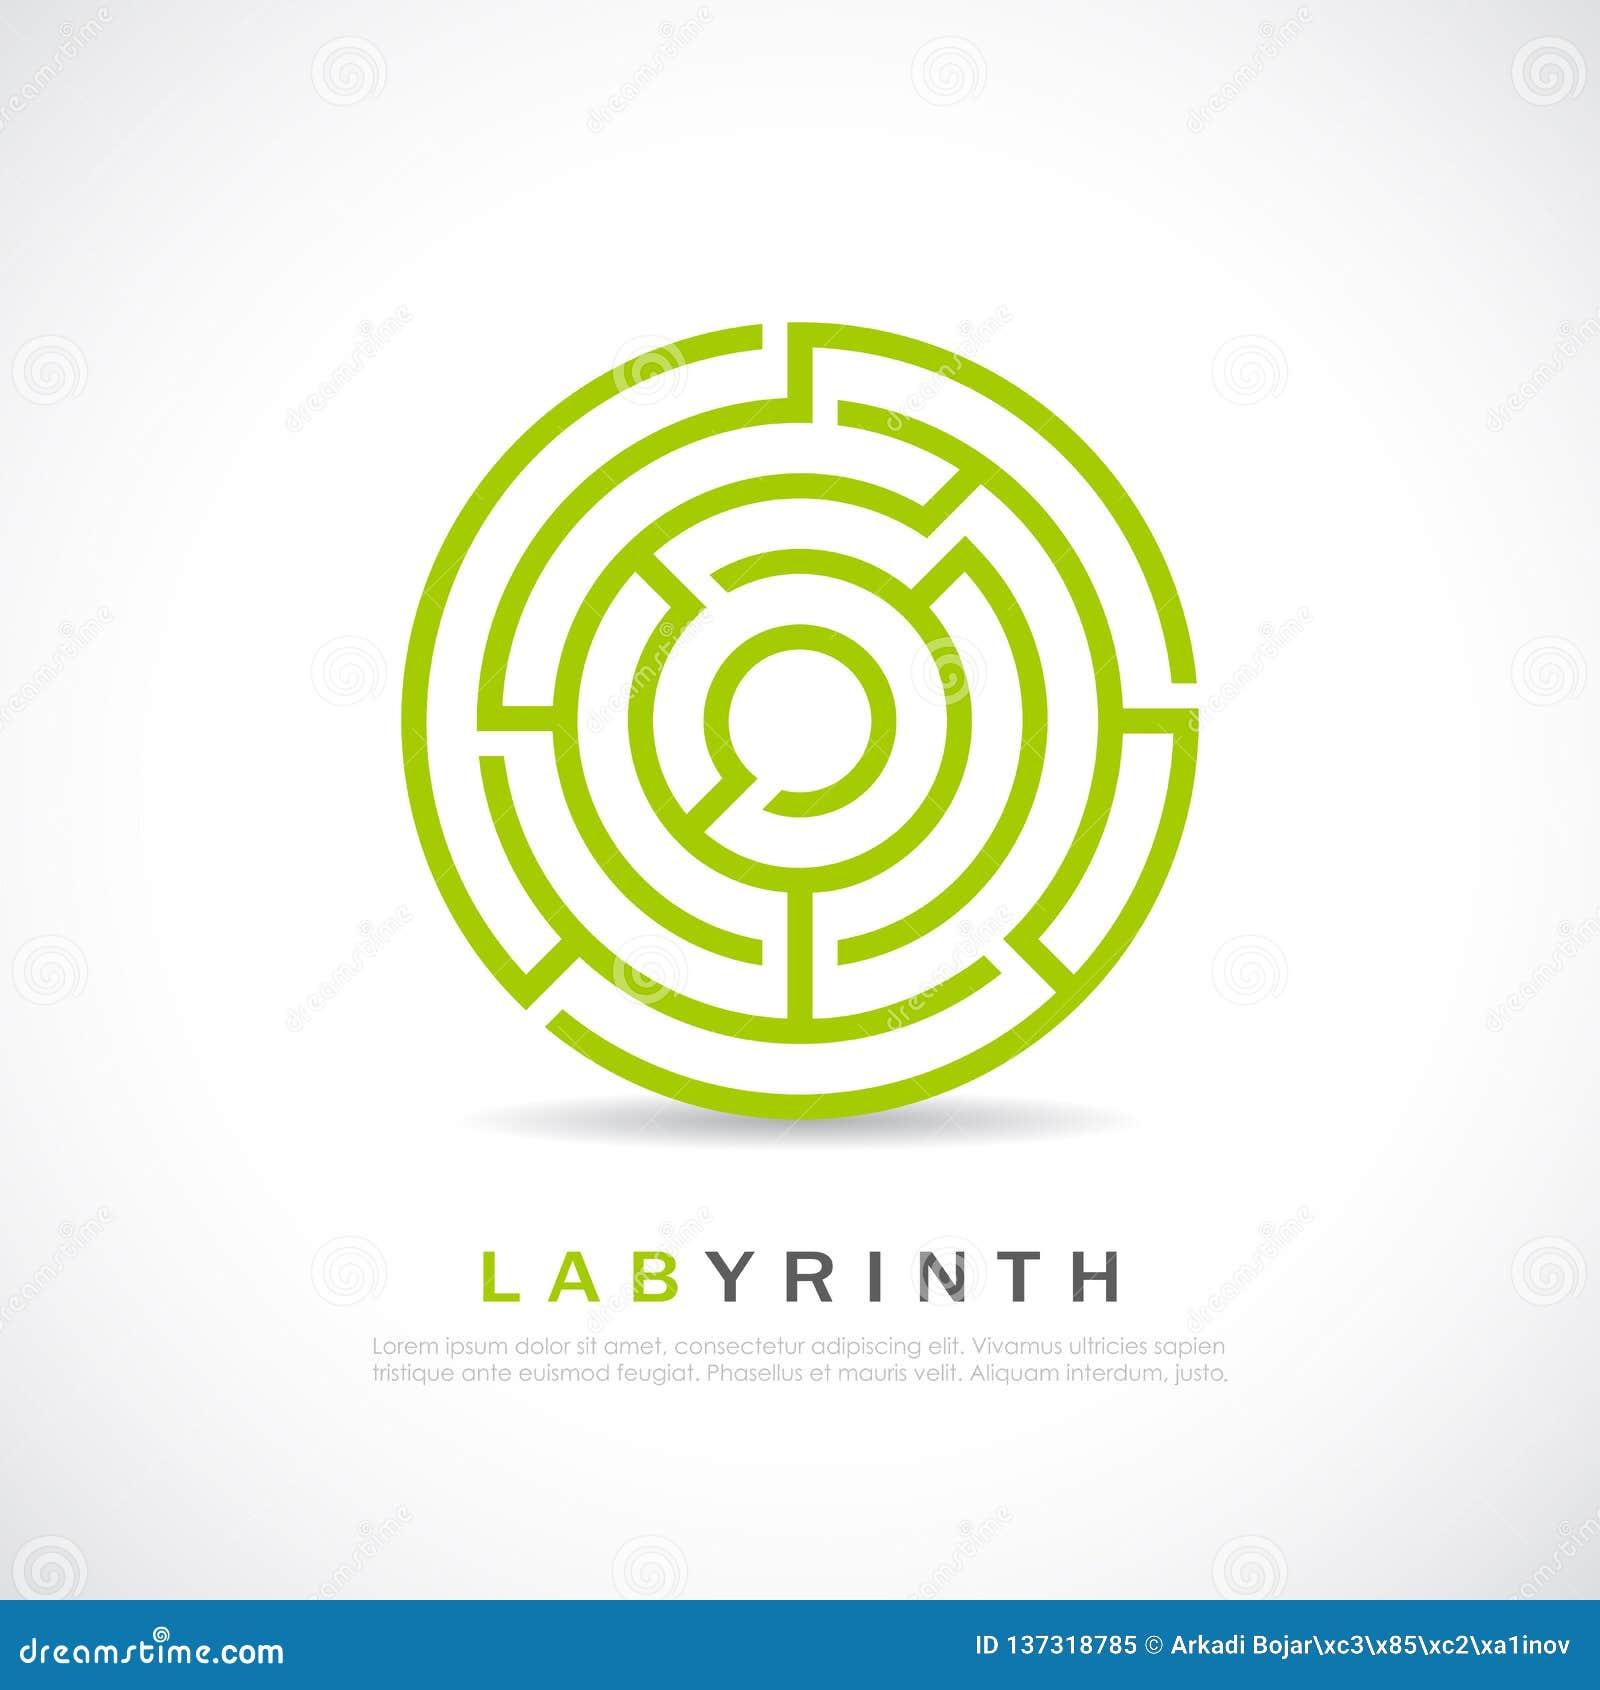 Labyrinth Logo Design With 3D Effect Vector Illustration